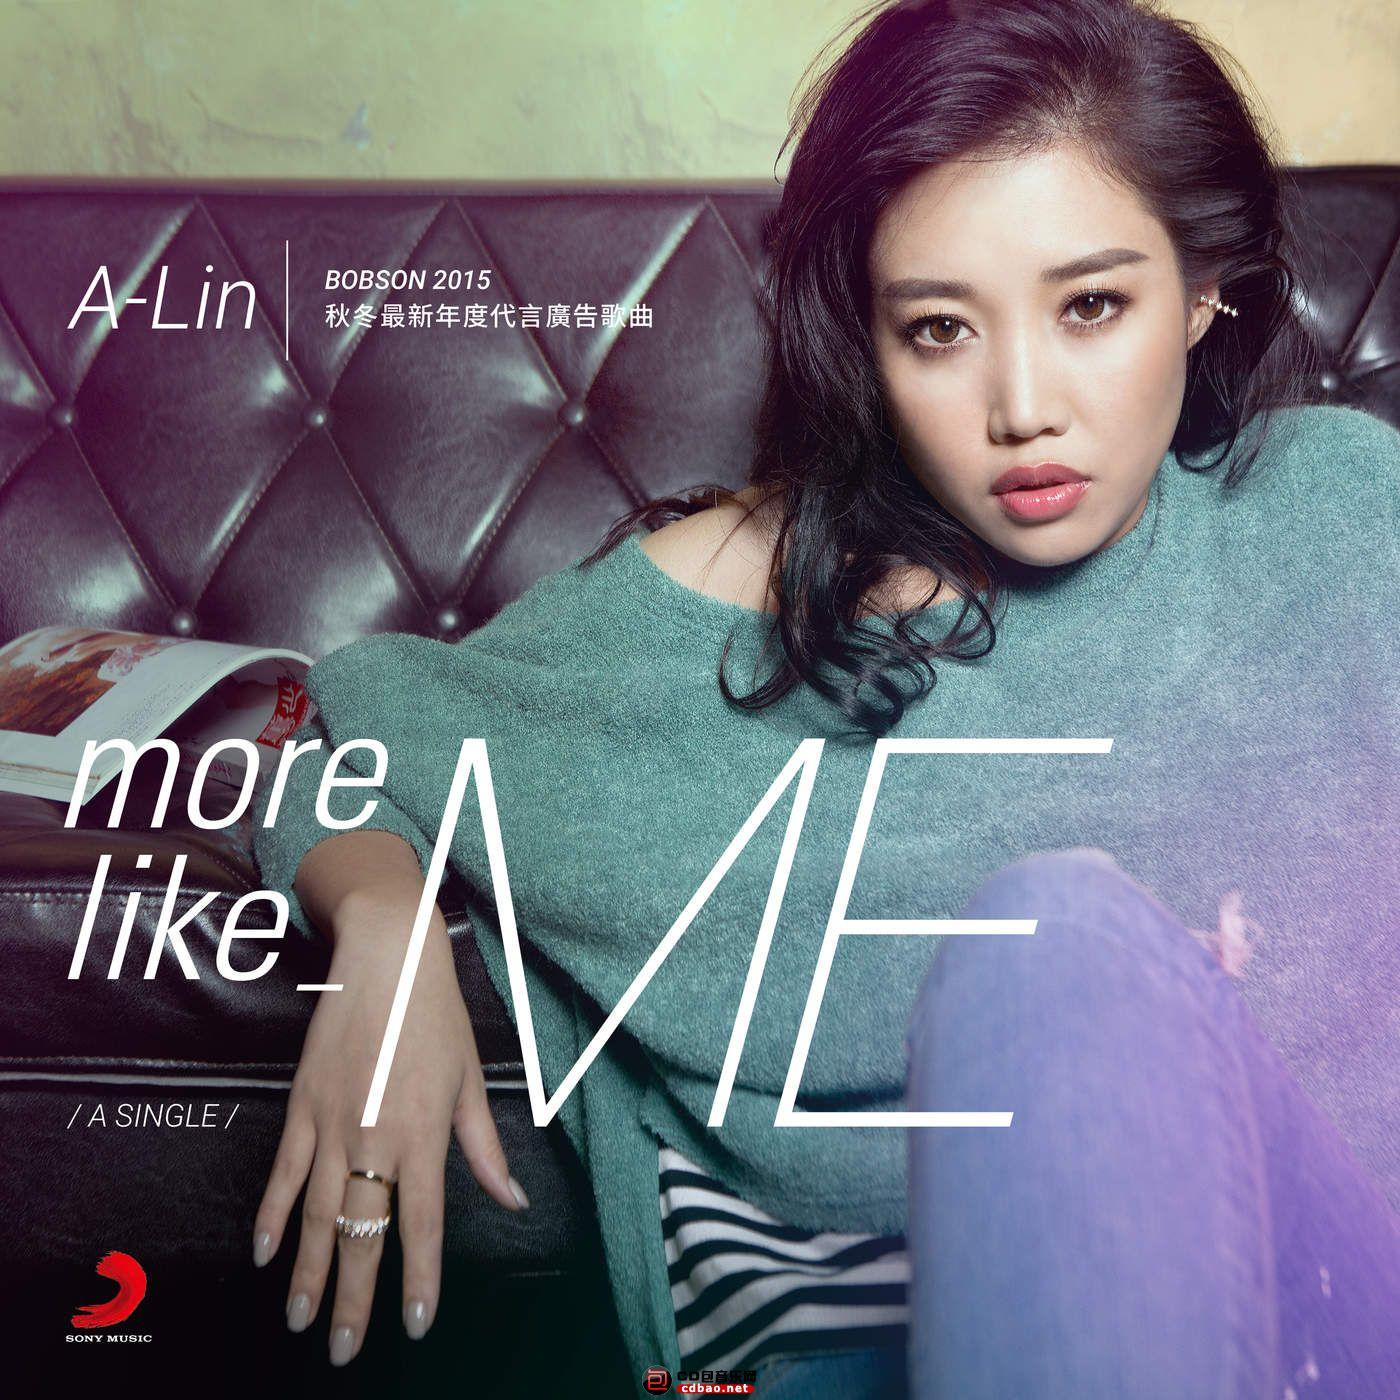 More Like Me (BOBSON 2015 秋冬最新年度代言廣告單曲) - Single.jpg